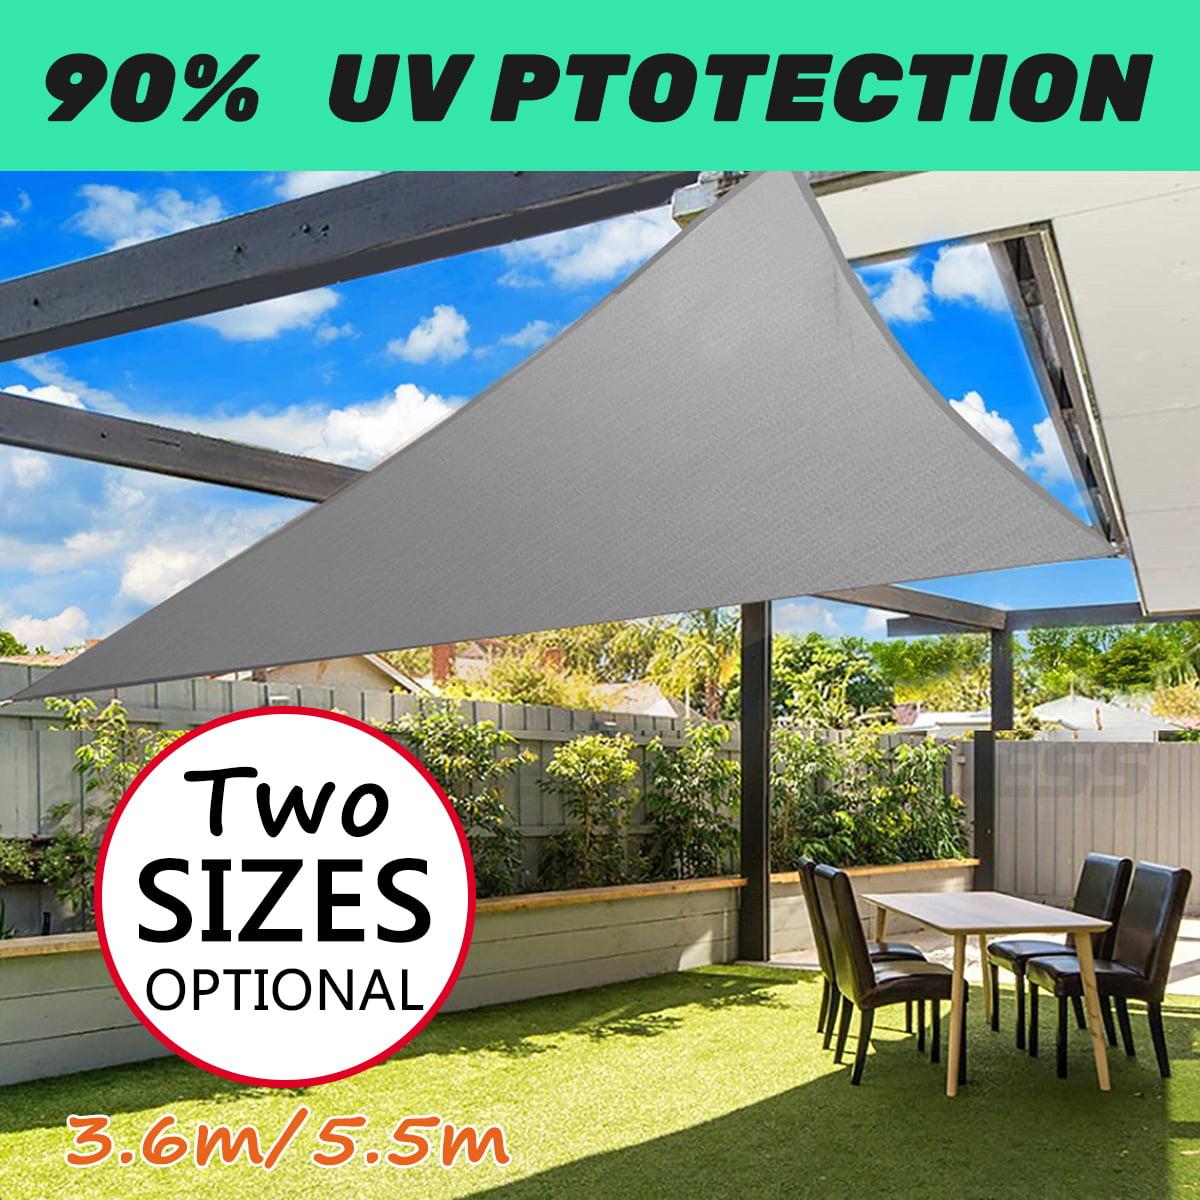 3.6m/5m Triangle Waterproof Sun Shade Shield Sail Garden Patio Sun-resistant Awning Canopy Sunscreen Cover